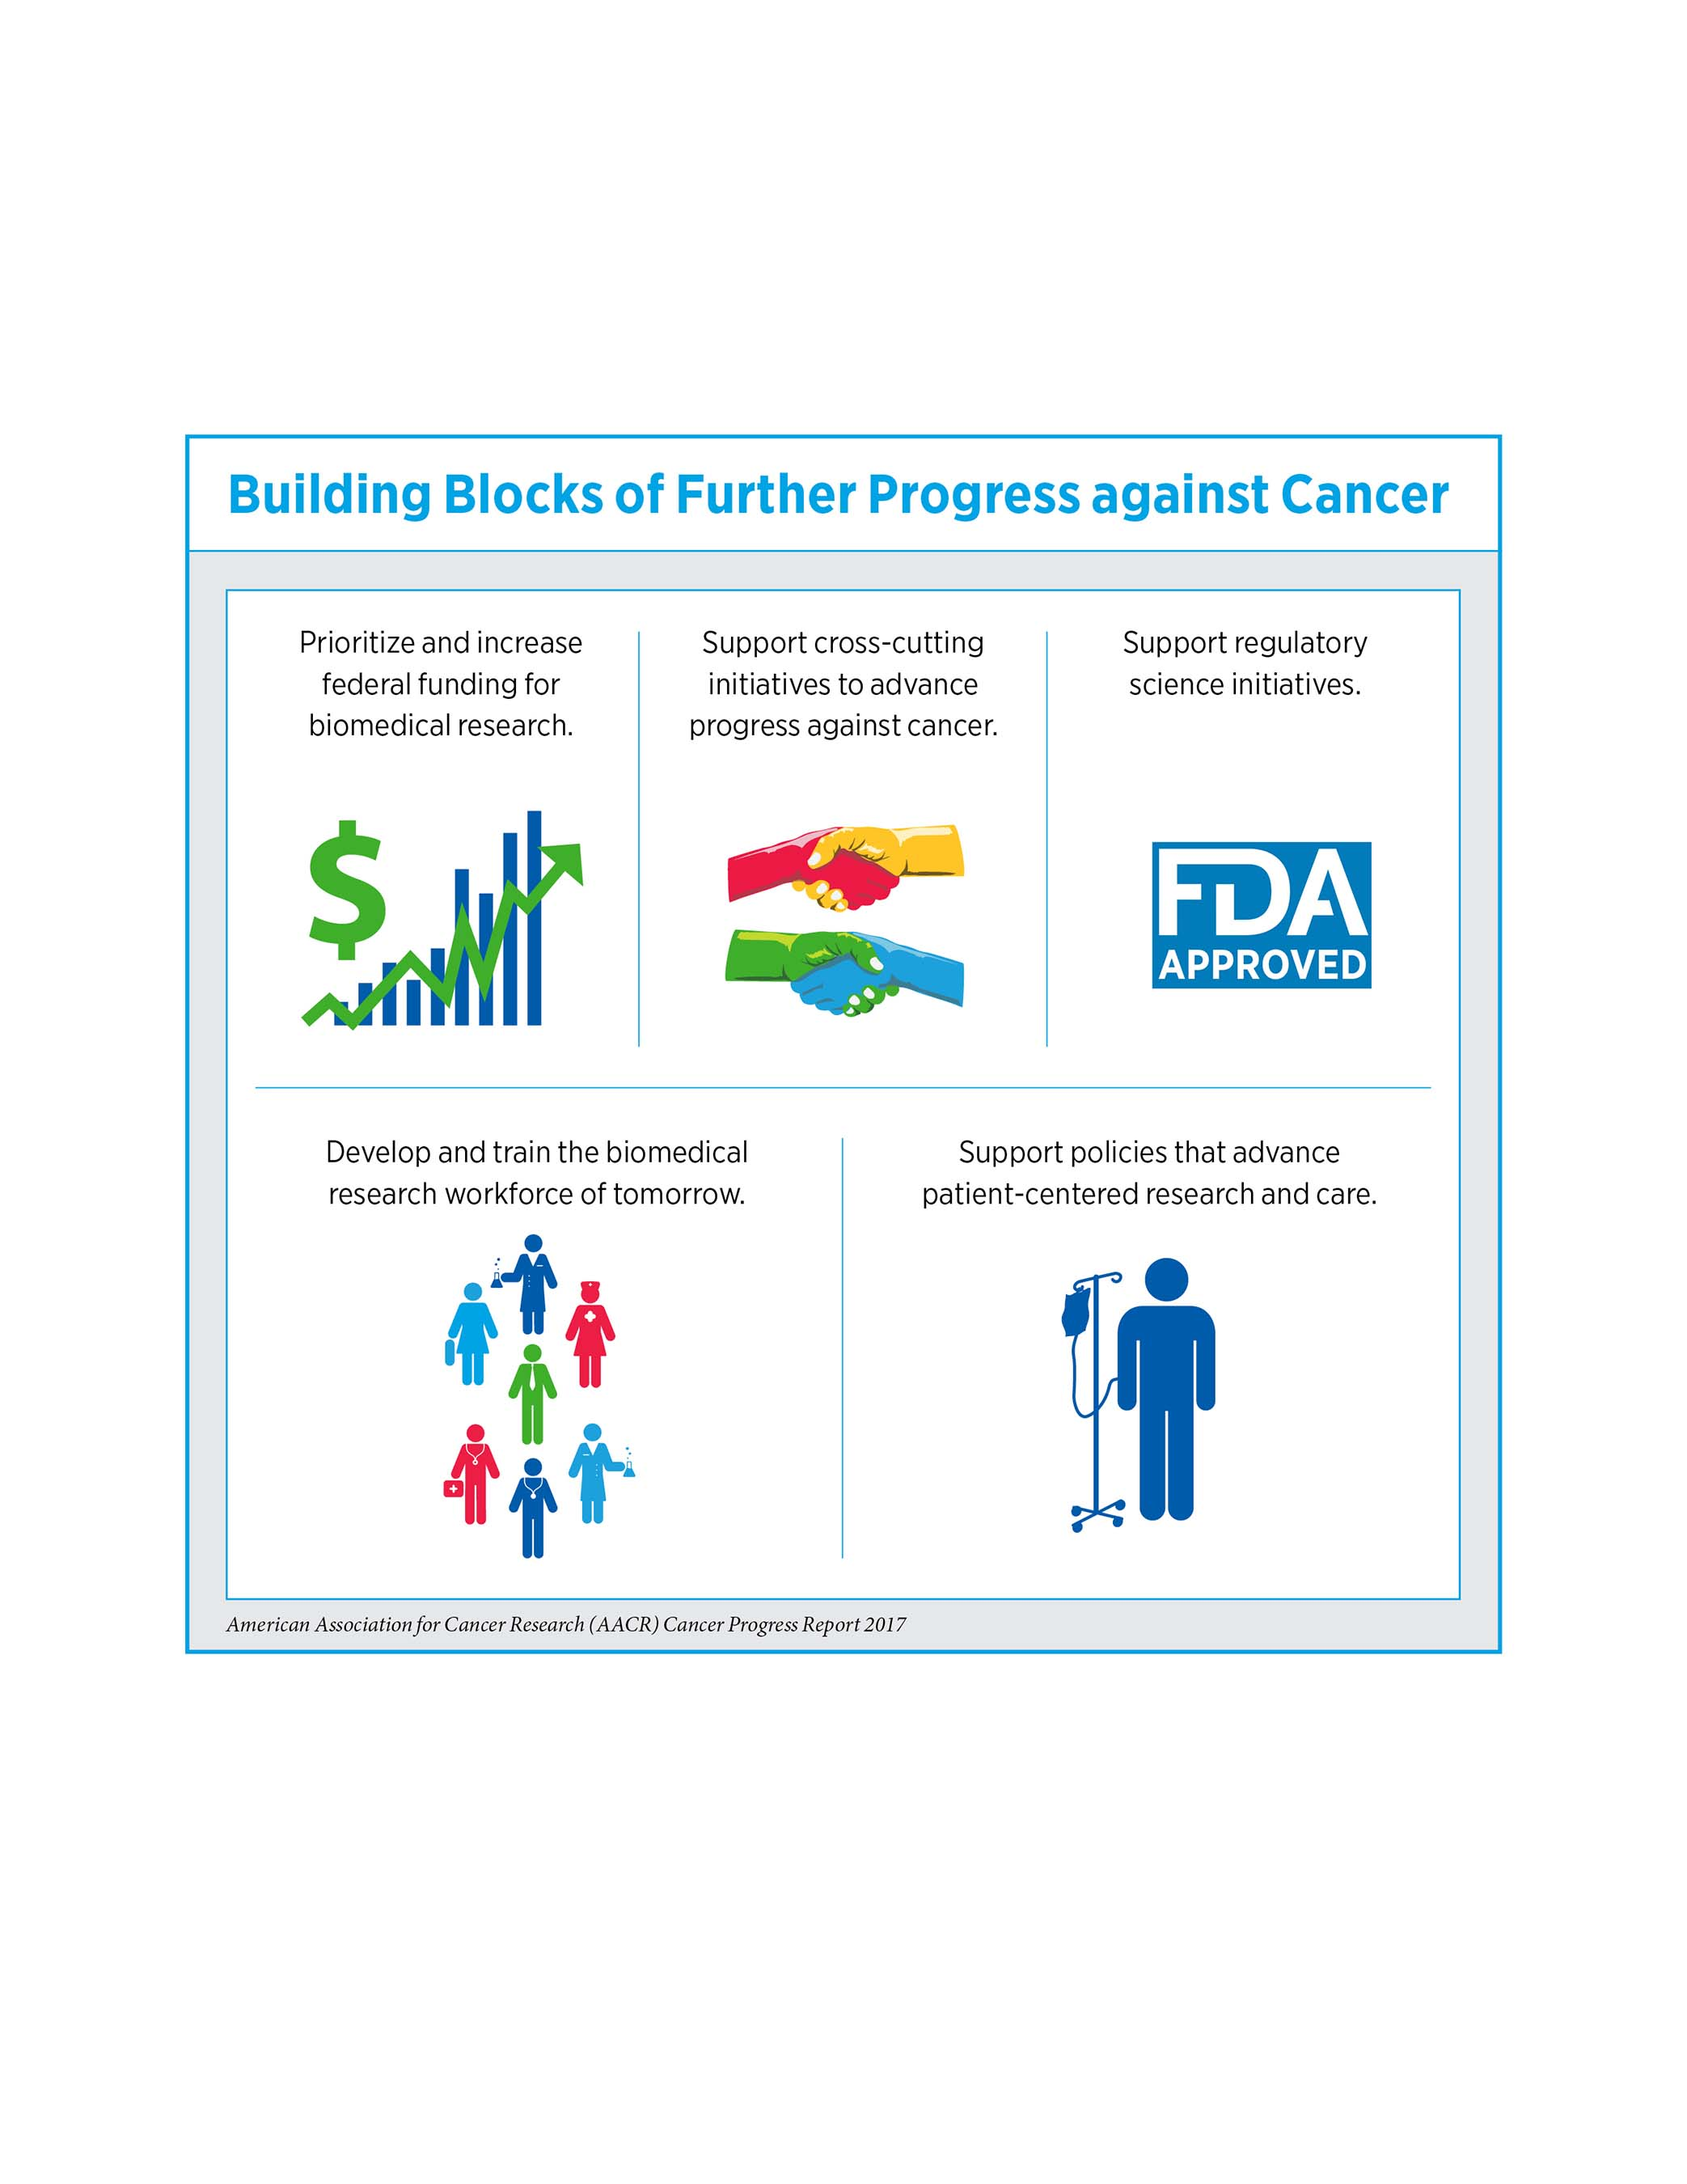 Progress Against Cancer